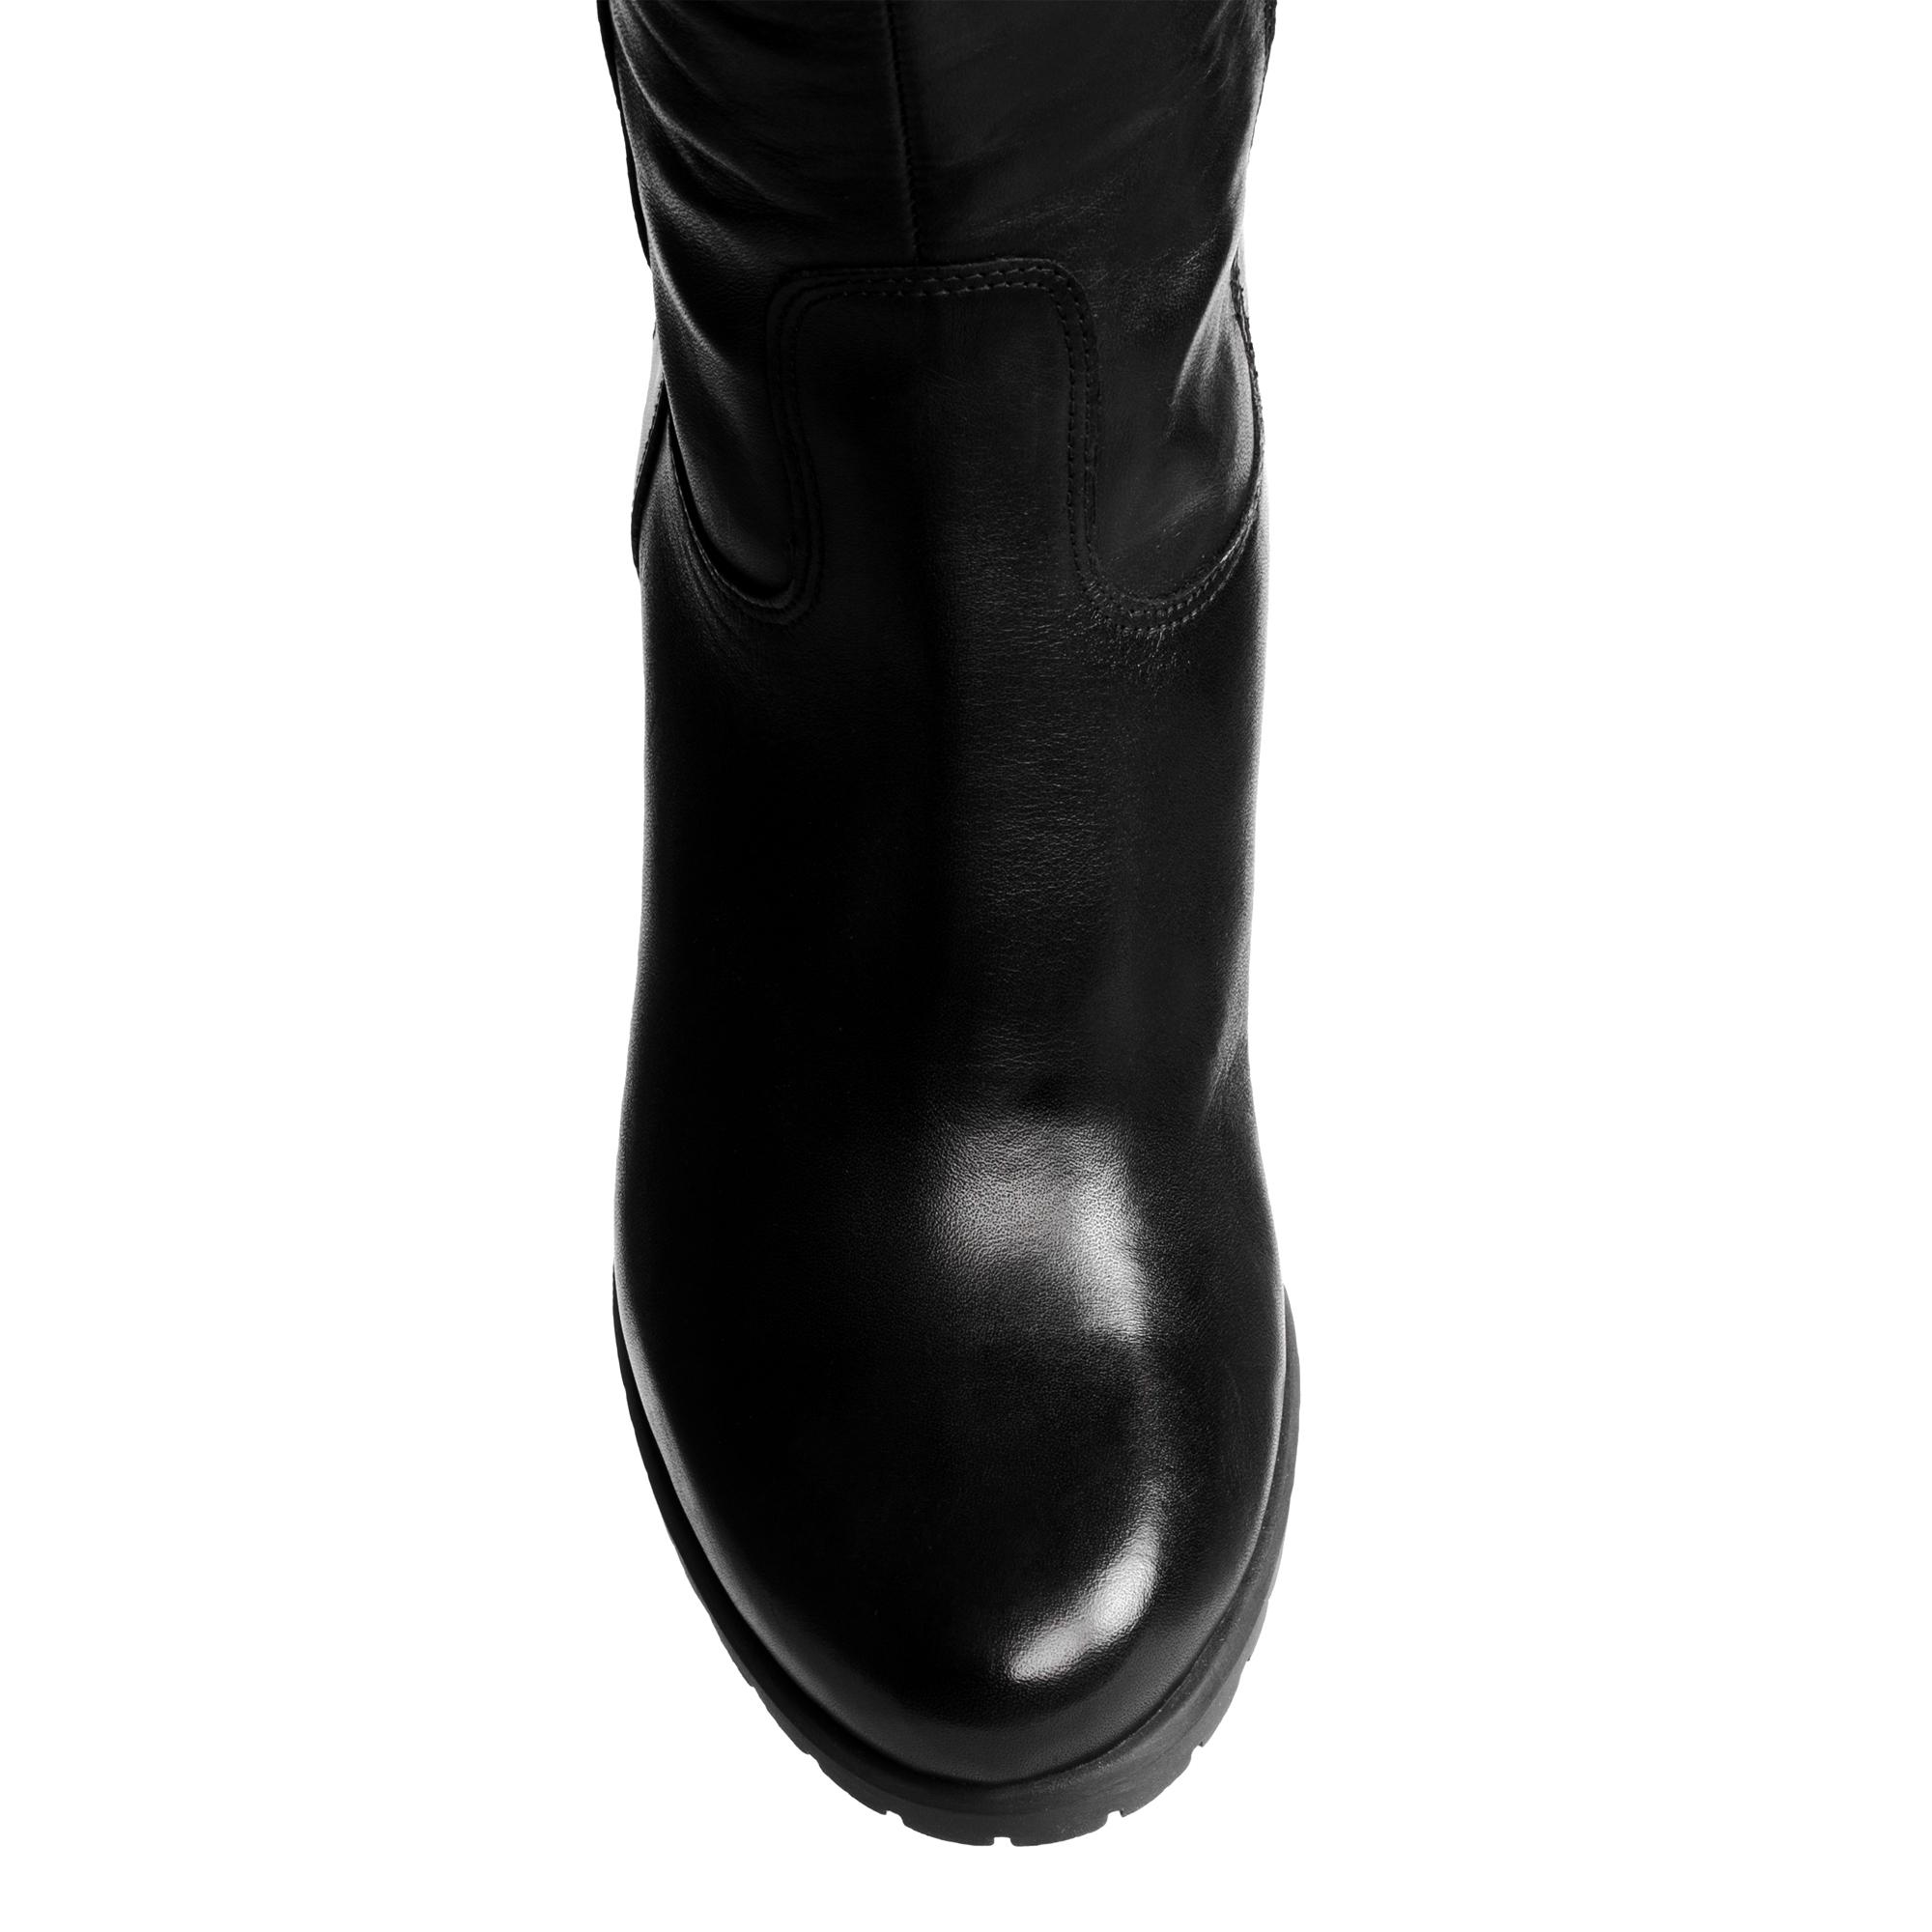 Сапоги на каблуке CorsoComo (Корсо Комо) 36-7911-2 Сапоги женские, CC_I-LUZ-7911_energy_nero, черный, шер